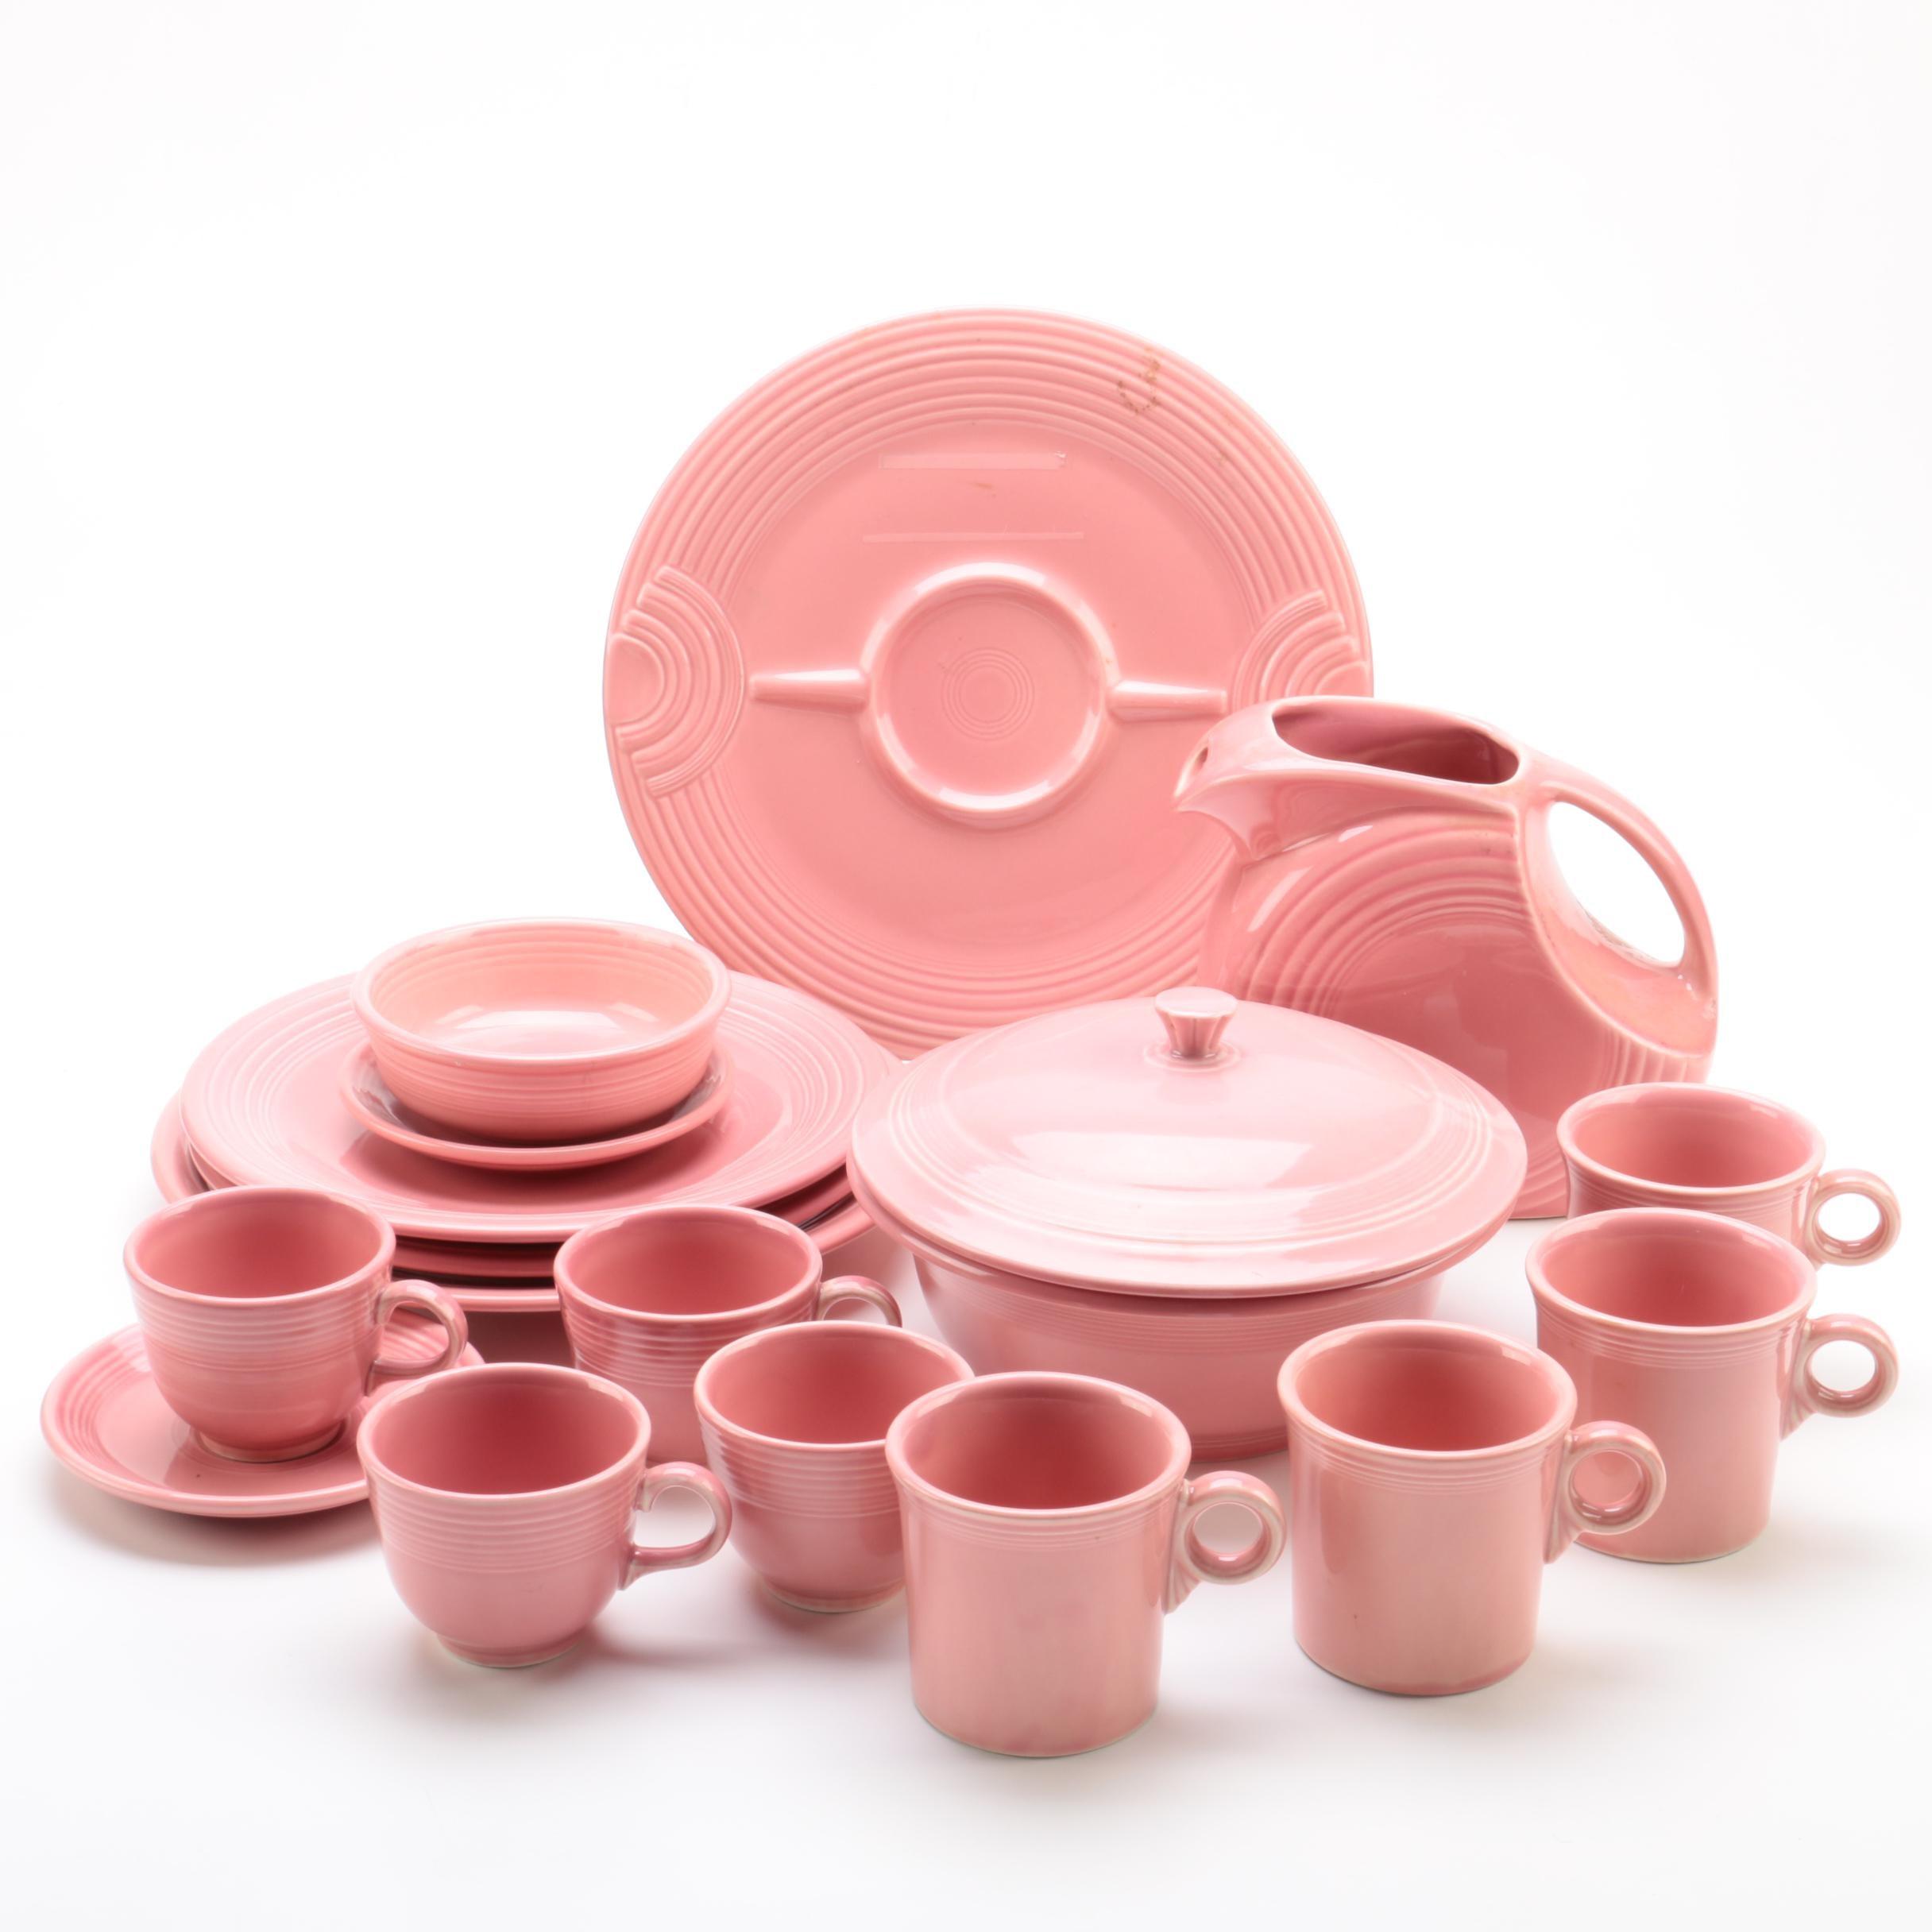 Fiesta Ware  Flamingo Pink  Tableware ...  sc 1 st  EBTH.com & Fiesta Ware